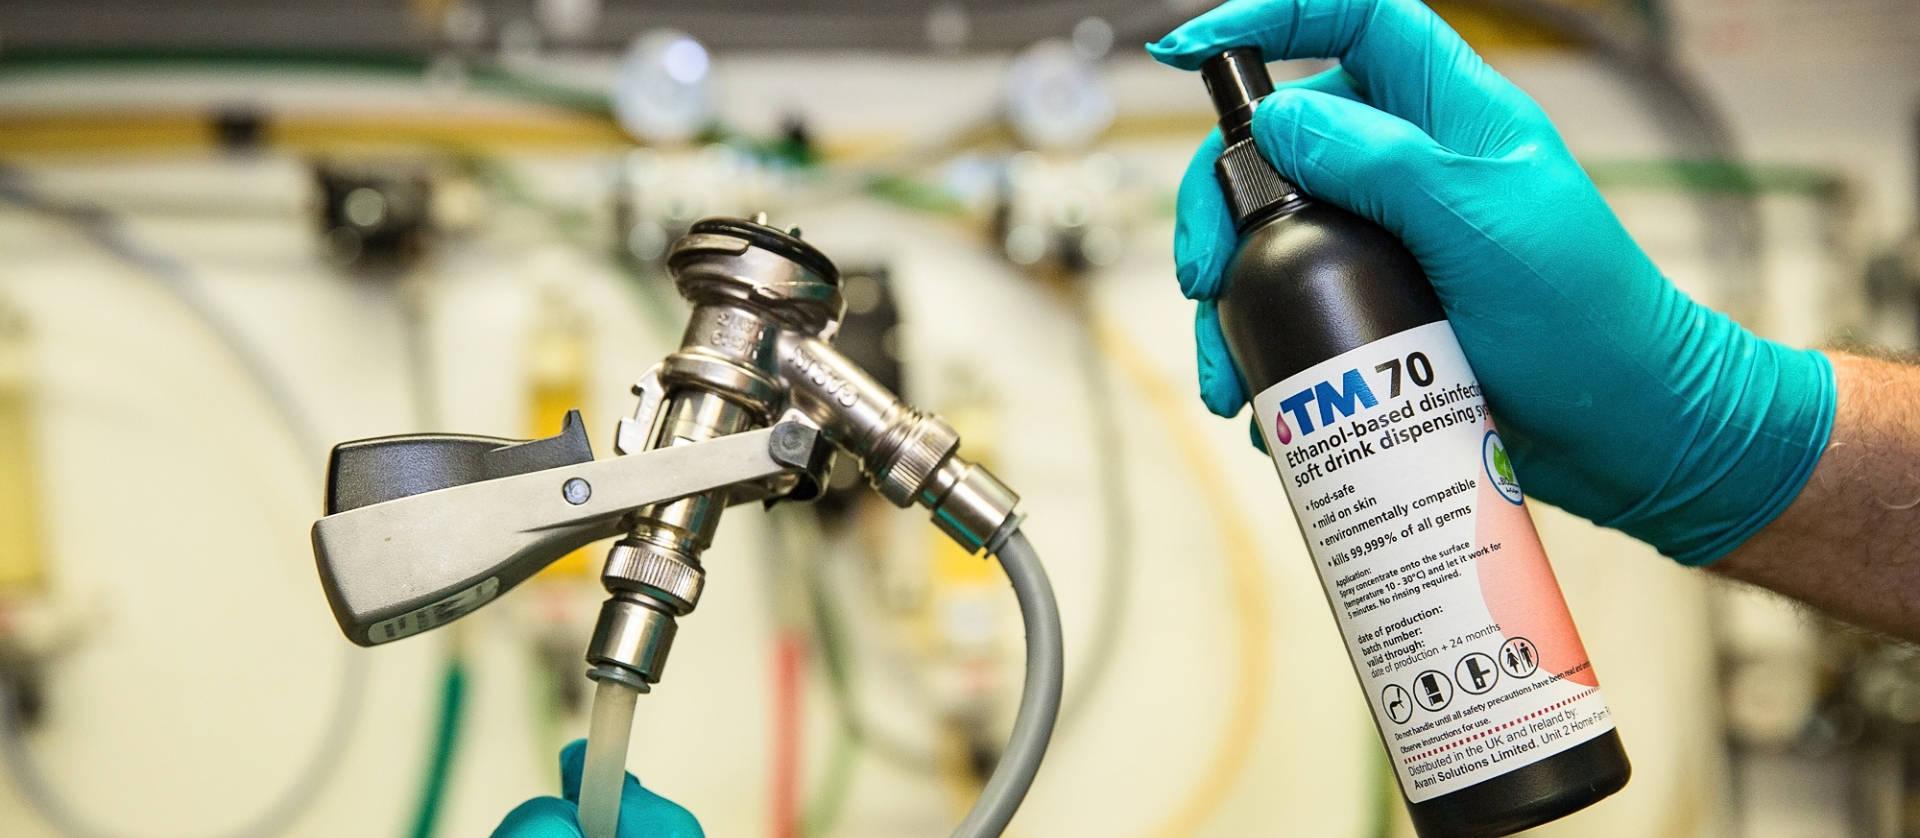 TM70 Sanitising spray